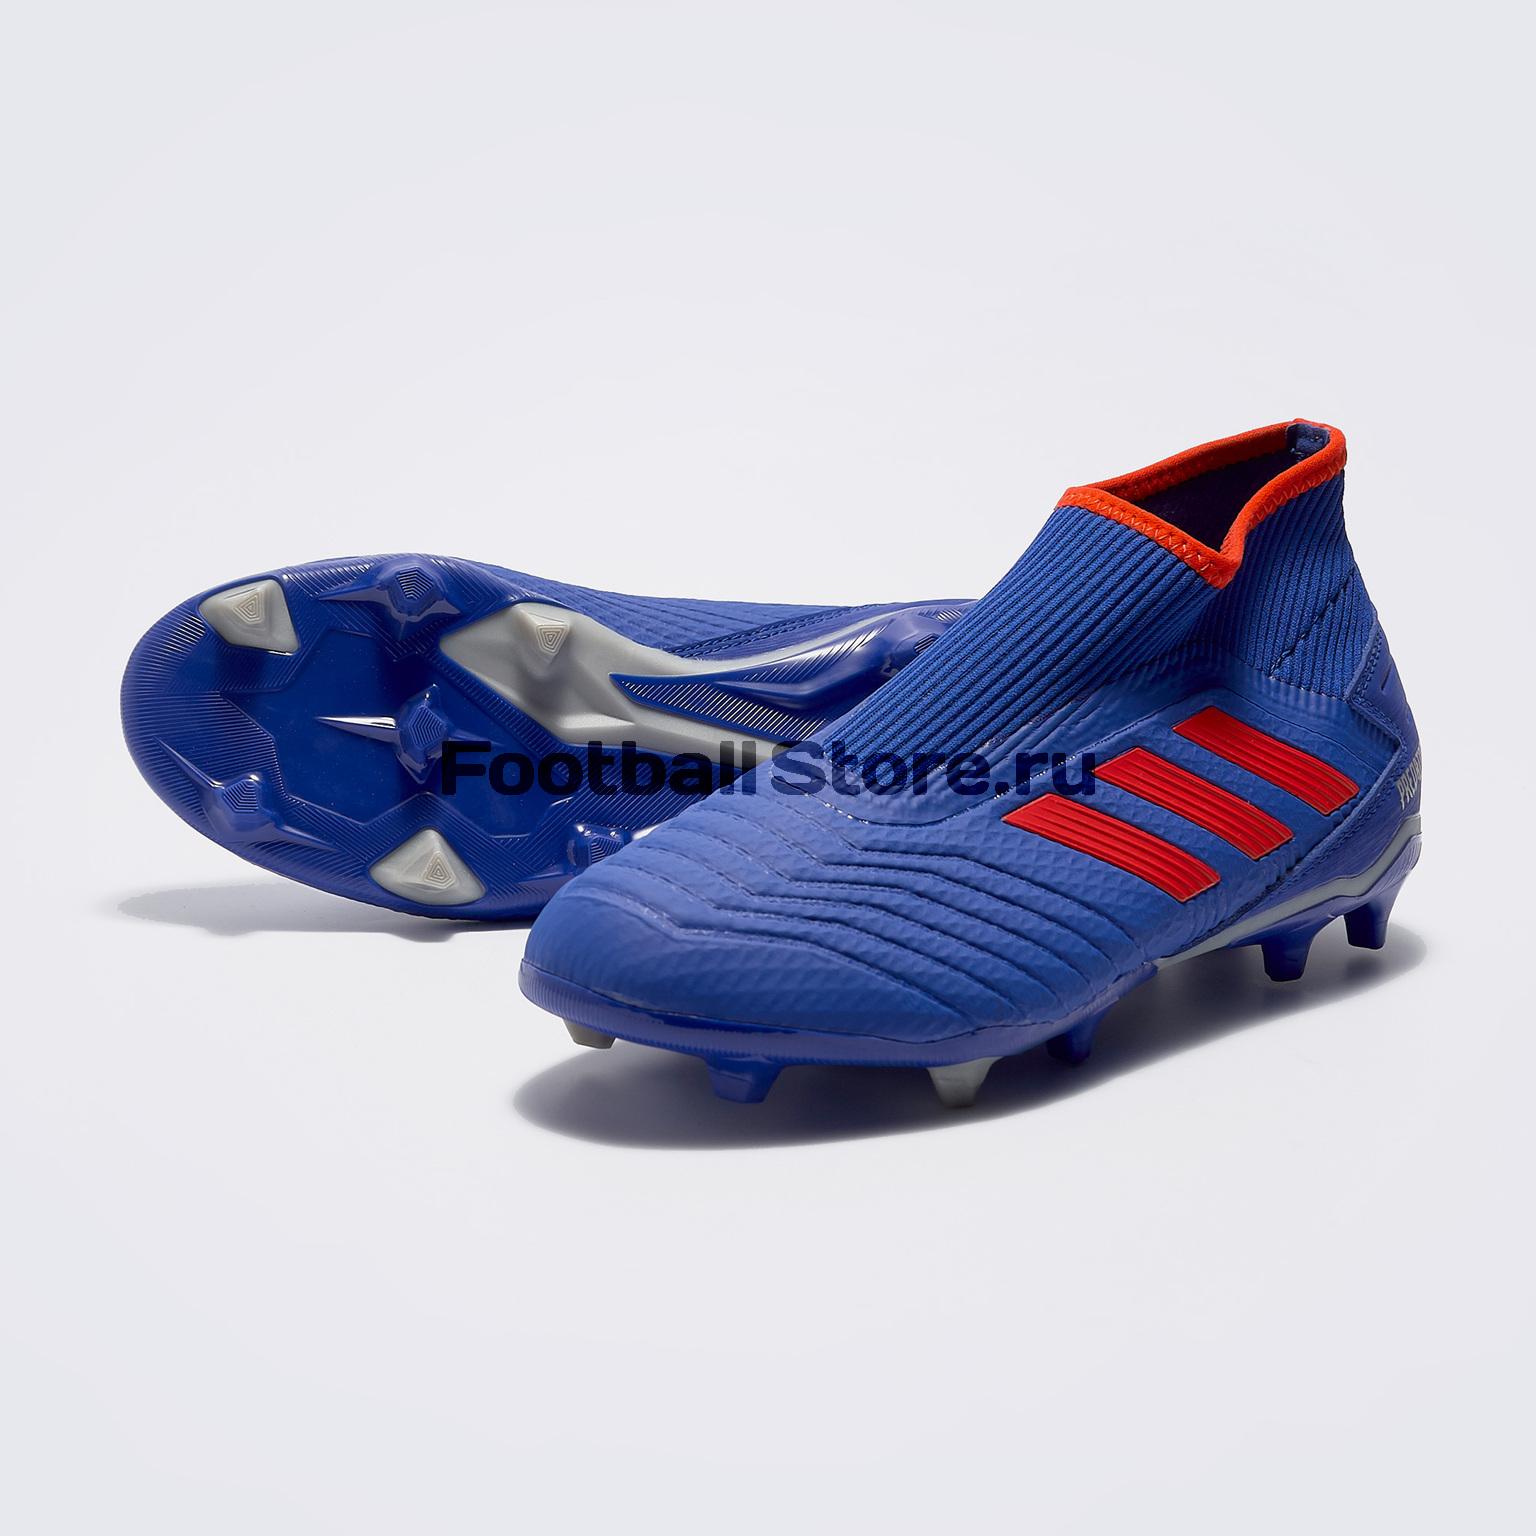 Бутсы Adidas Predator 19.3 LL FG F99731 бутсы adidas футбольные бутсы шиповки x 16 1 cage